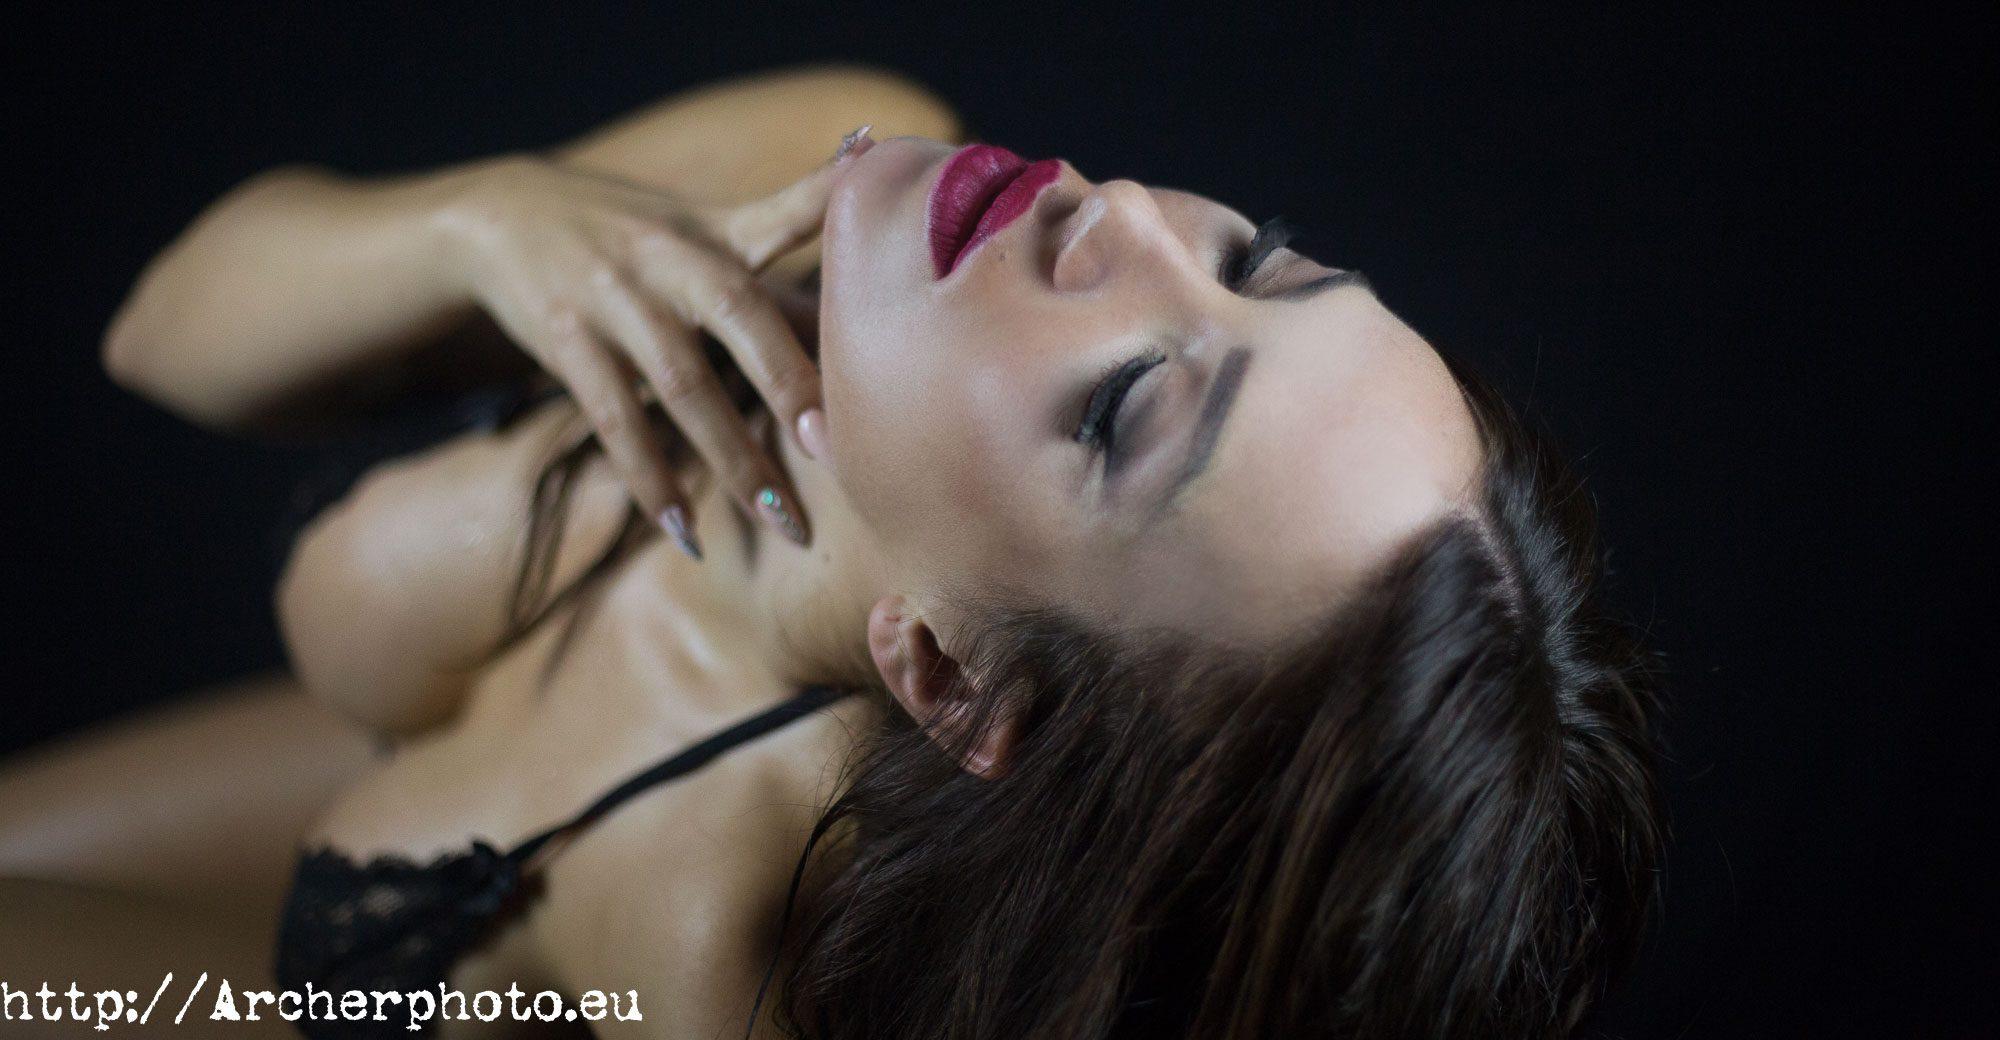 Vicctoria - Fotografía boudoir - Archerphoto - Sergi Albir